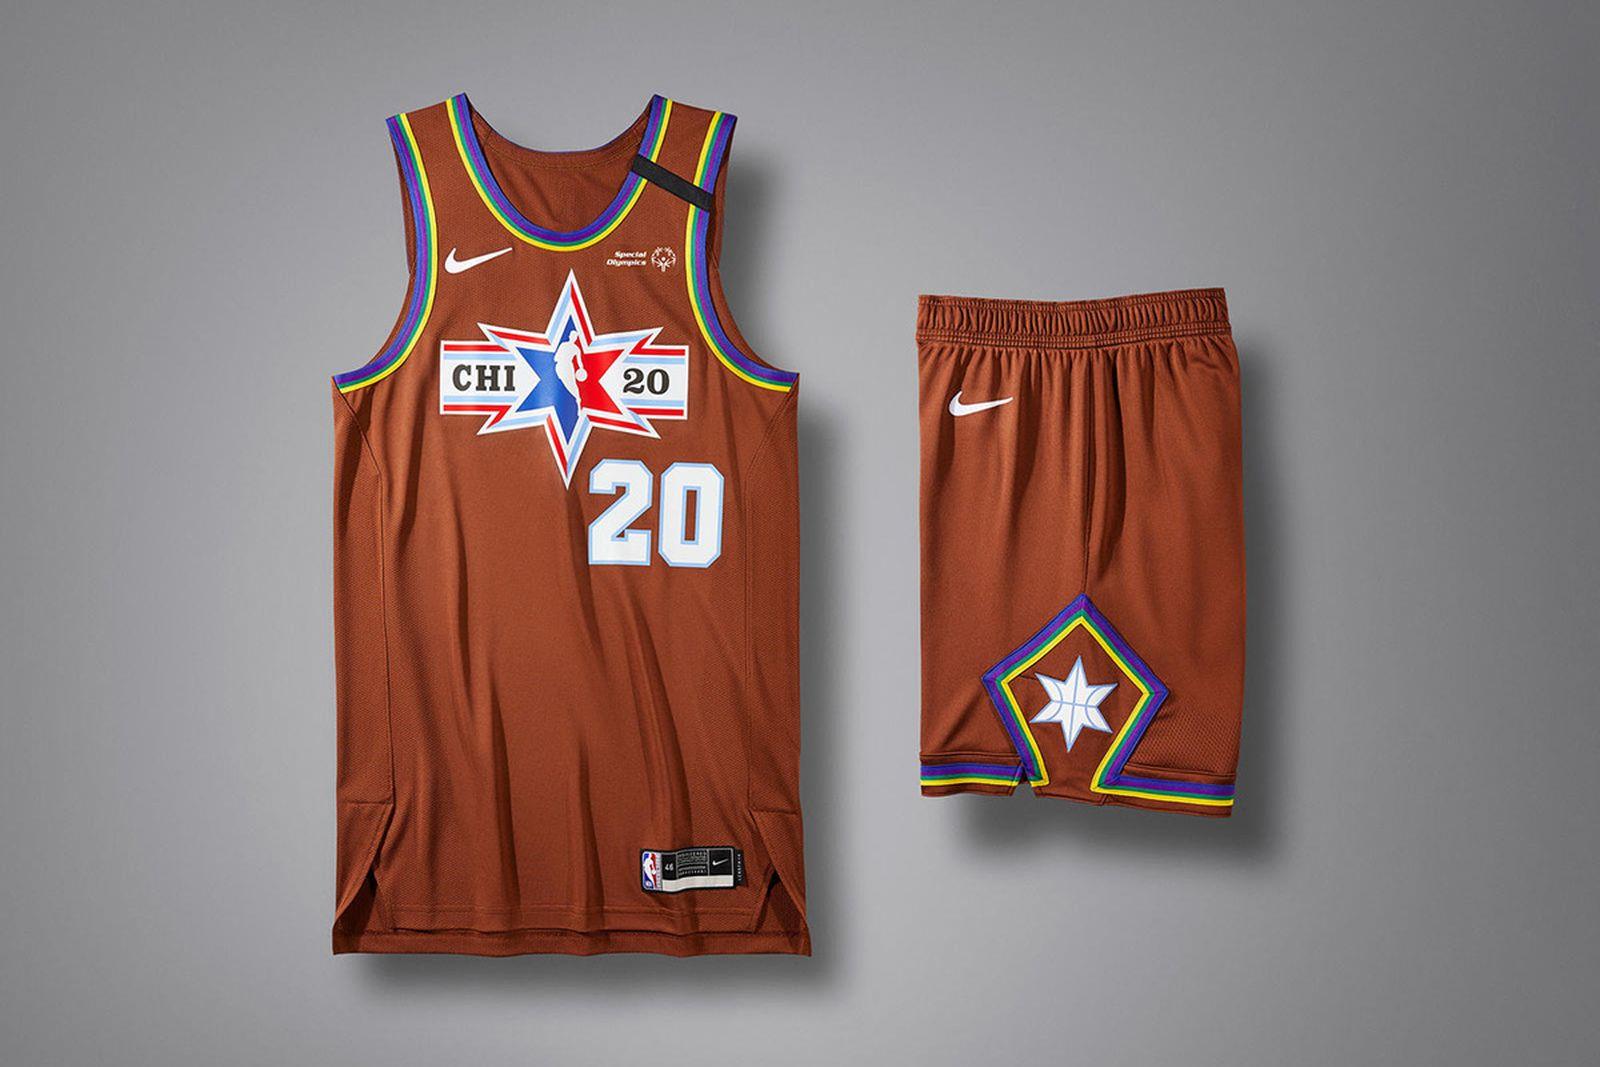 jordan-brand-nba-star-game-uniforms-02